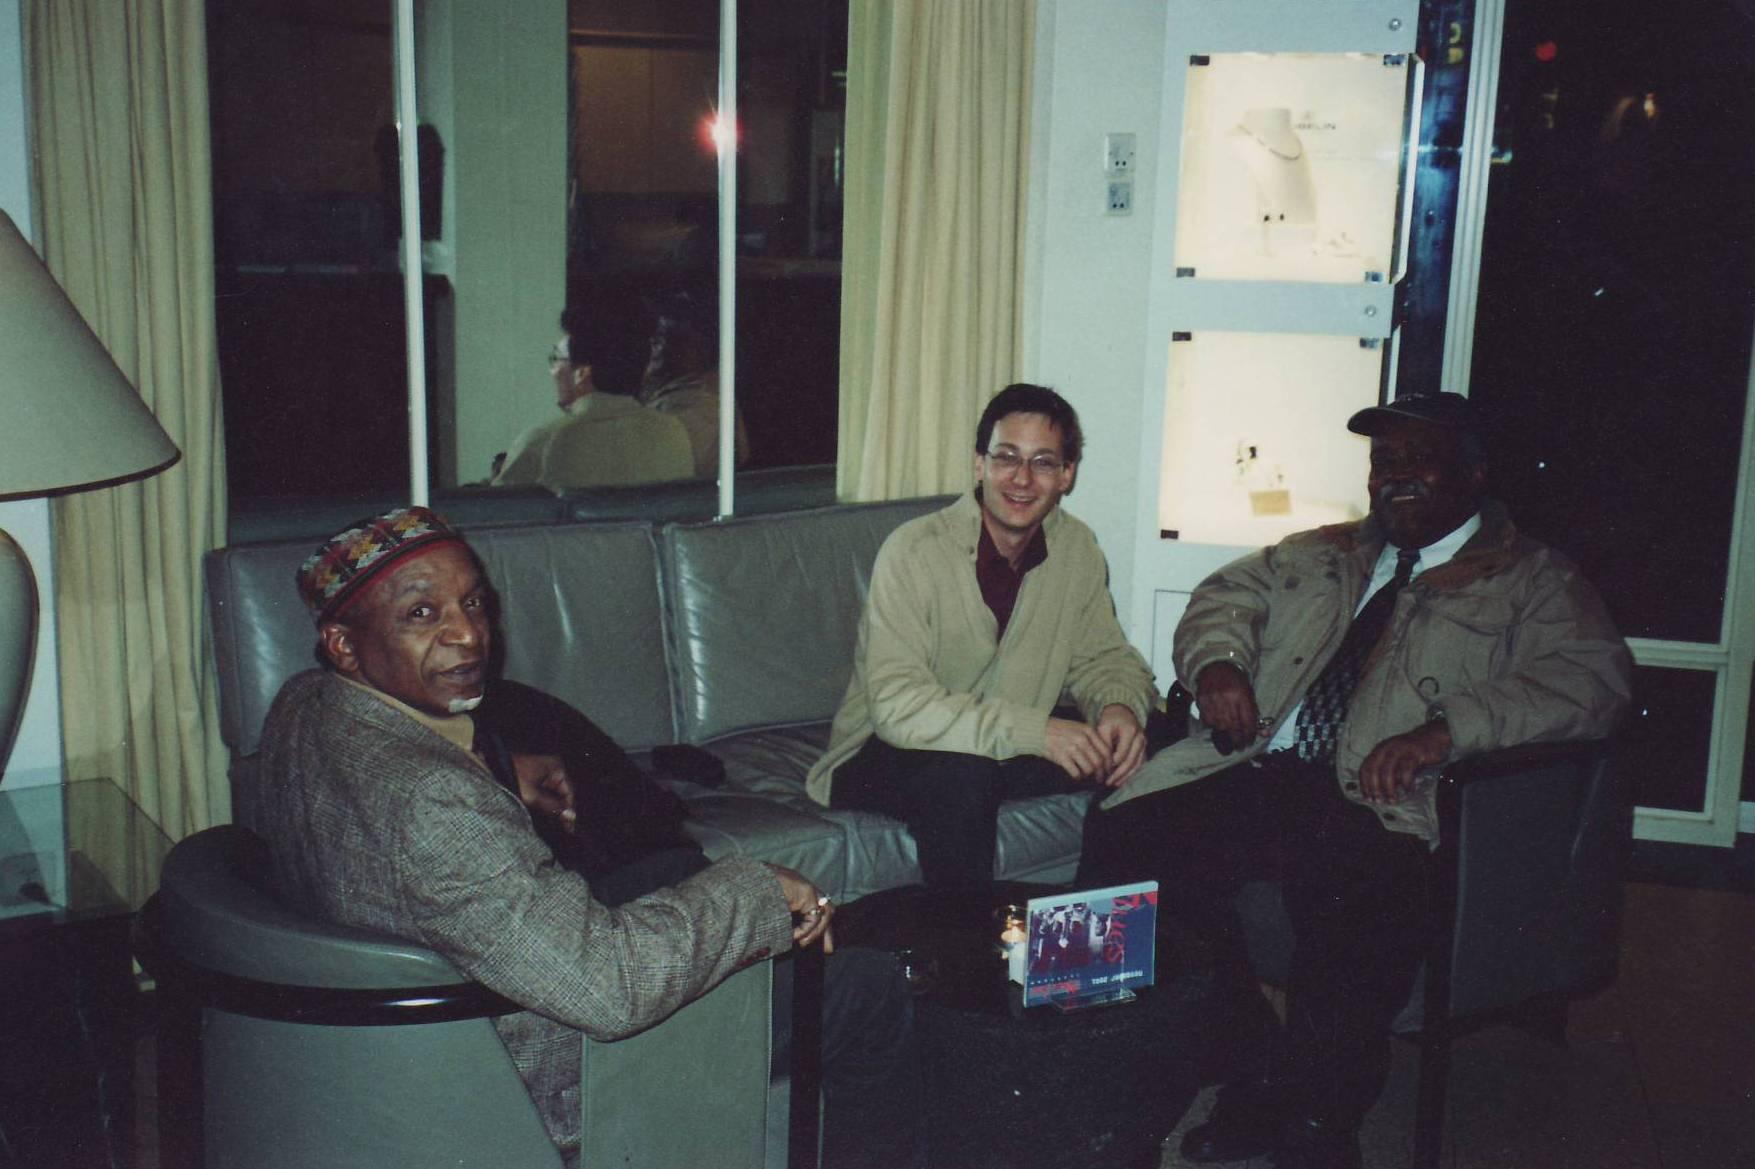 Nicolas Gilliet with Bobby Durham and Ray Bryant at International Jazzfestival Bern